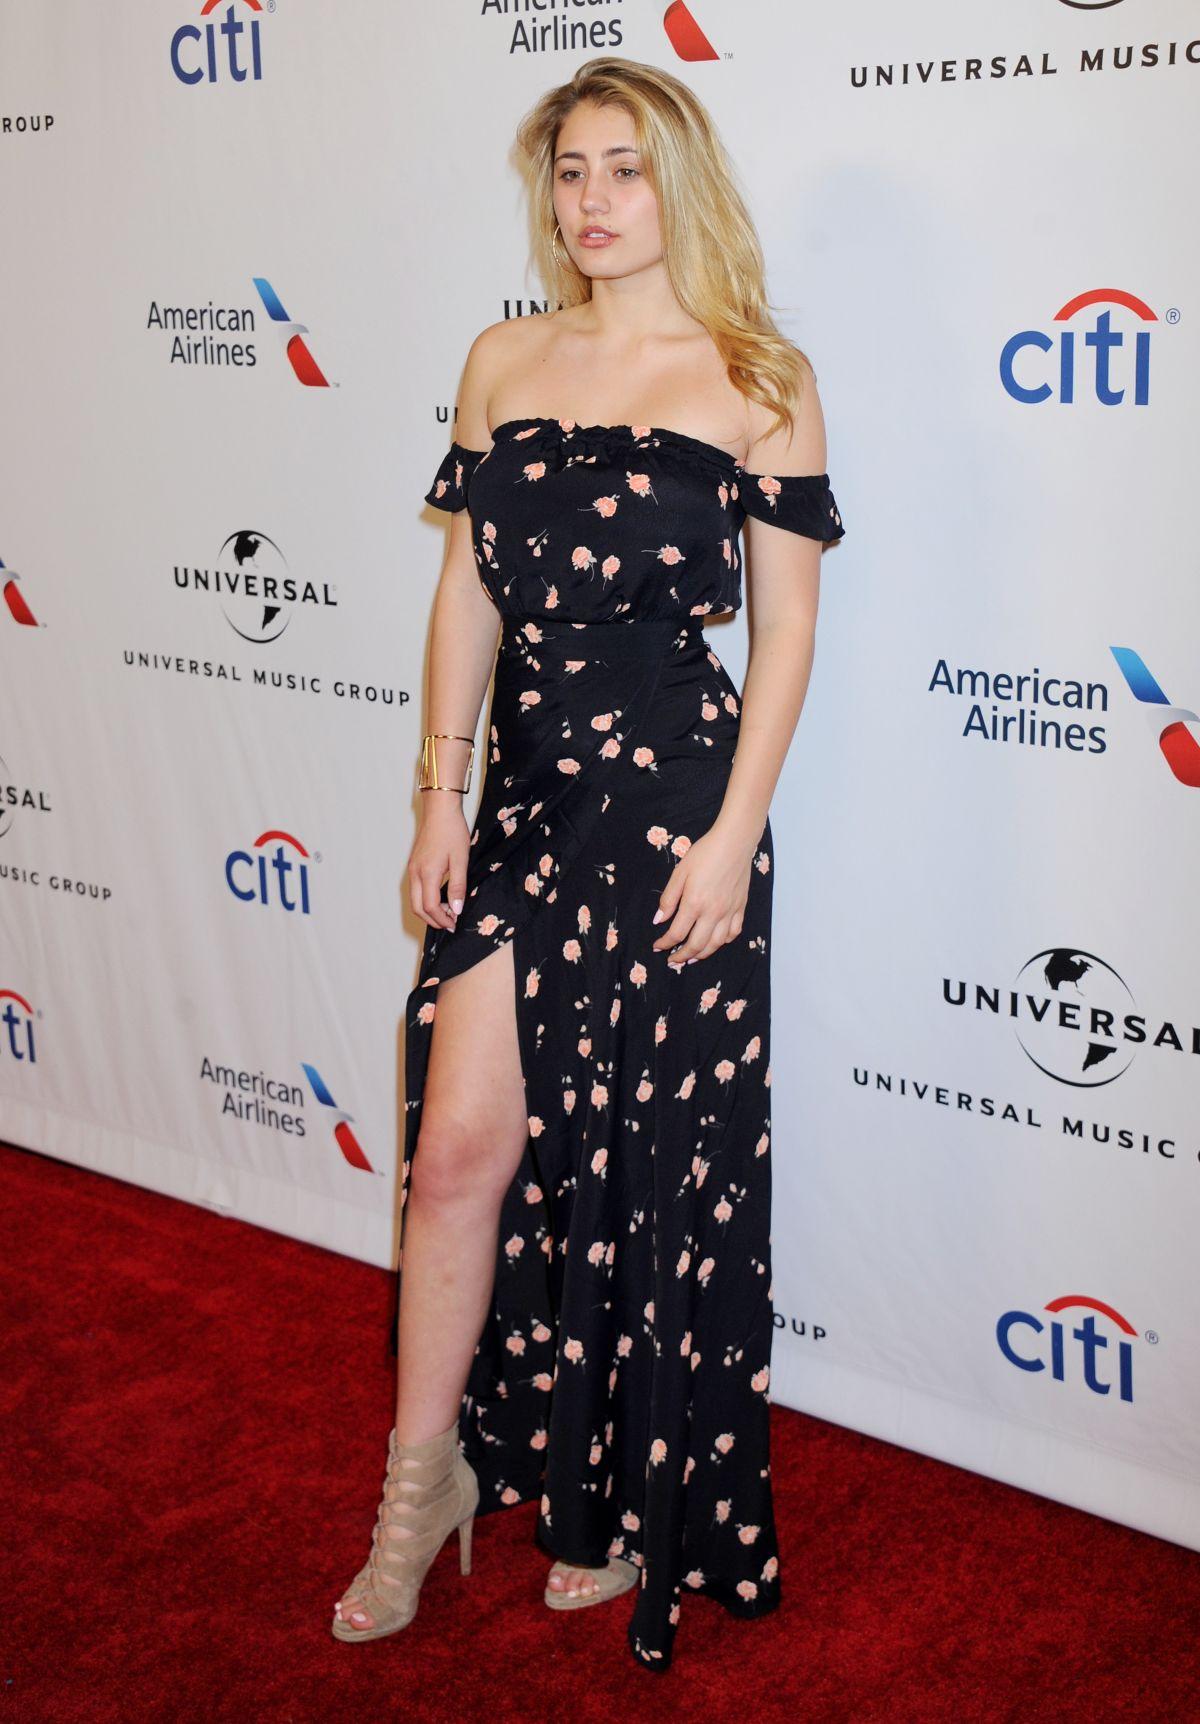 LIA MARIE JOHNSON at Universal Music Group 2016 Grammy